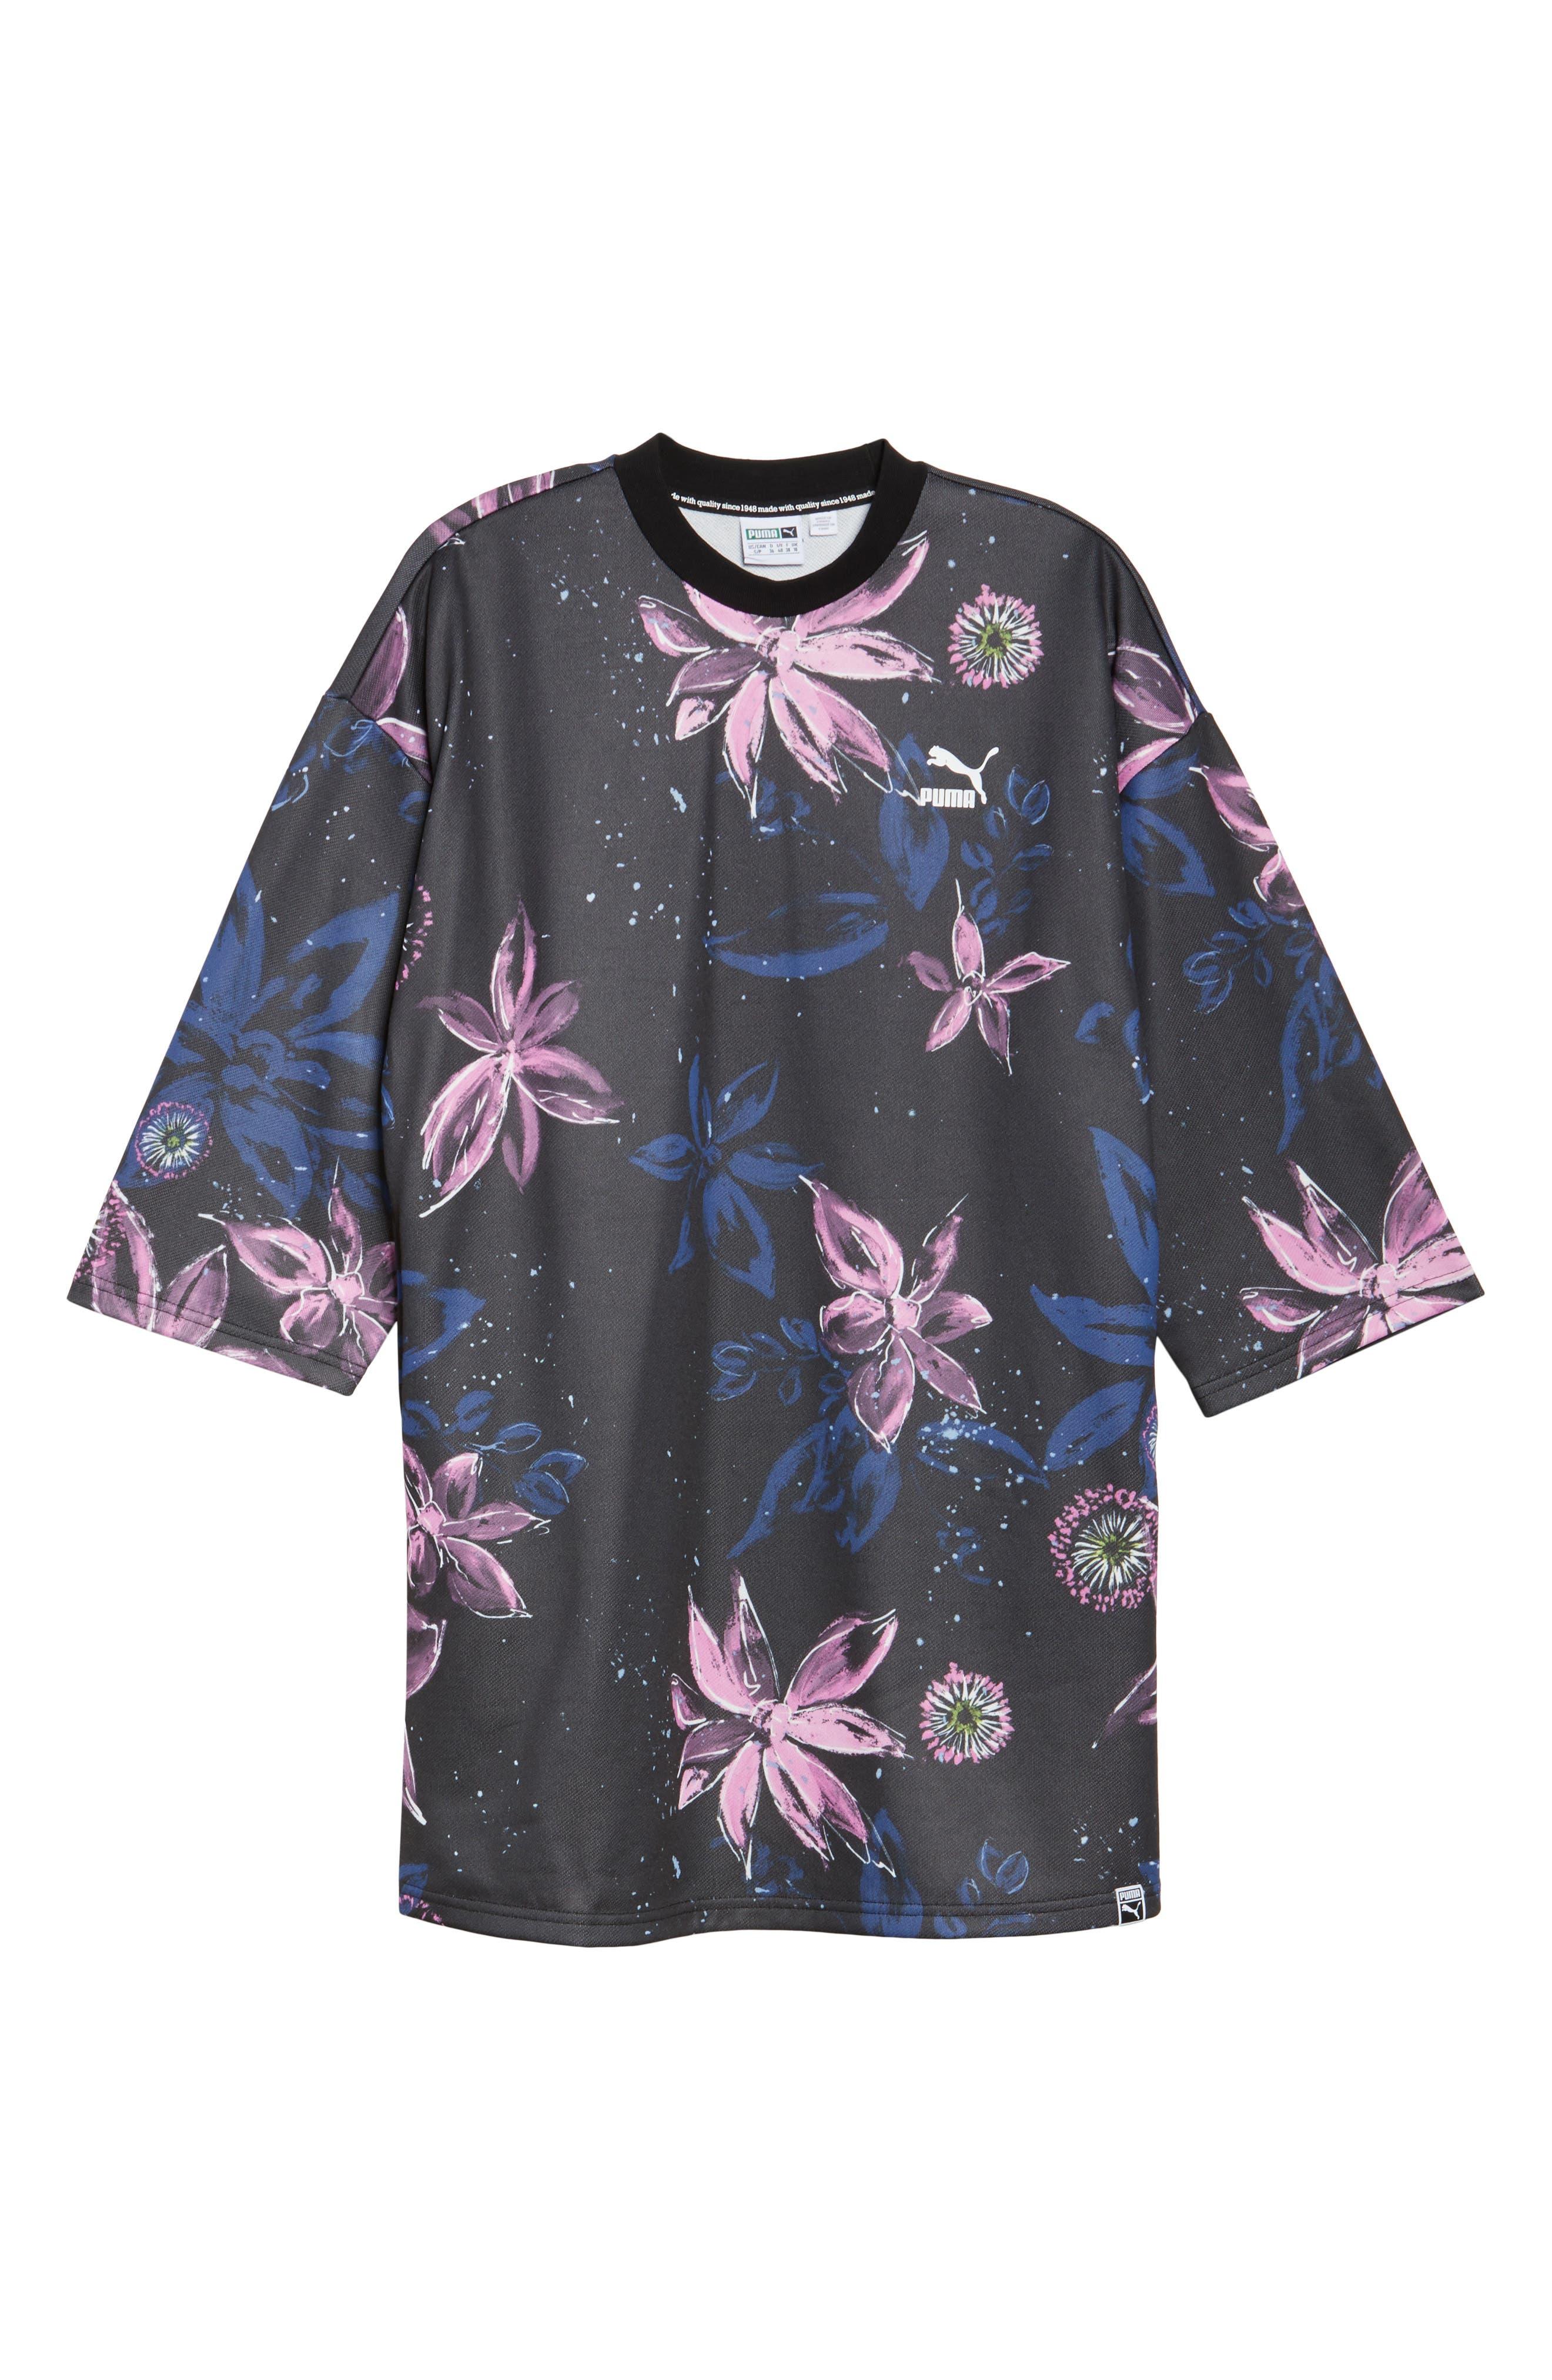 Archive No. 1 Logo T-Shirt Dress,                             Alternate thumbnail 7, color,                             001